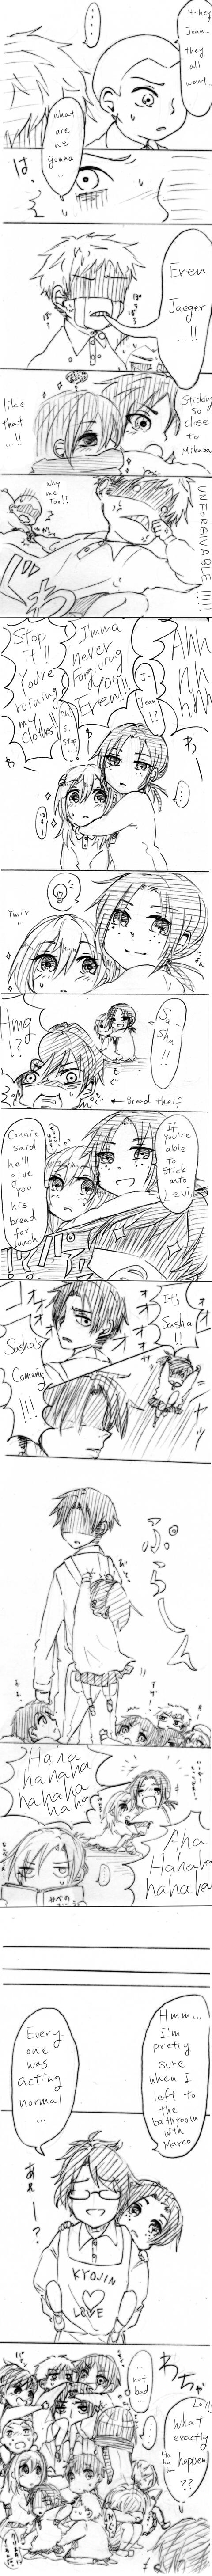 Shingeki no Kyojin(Attack on Titan) - Page 6 6cfd5252020d45fcdf2fbfb1df096a15-d69nju5